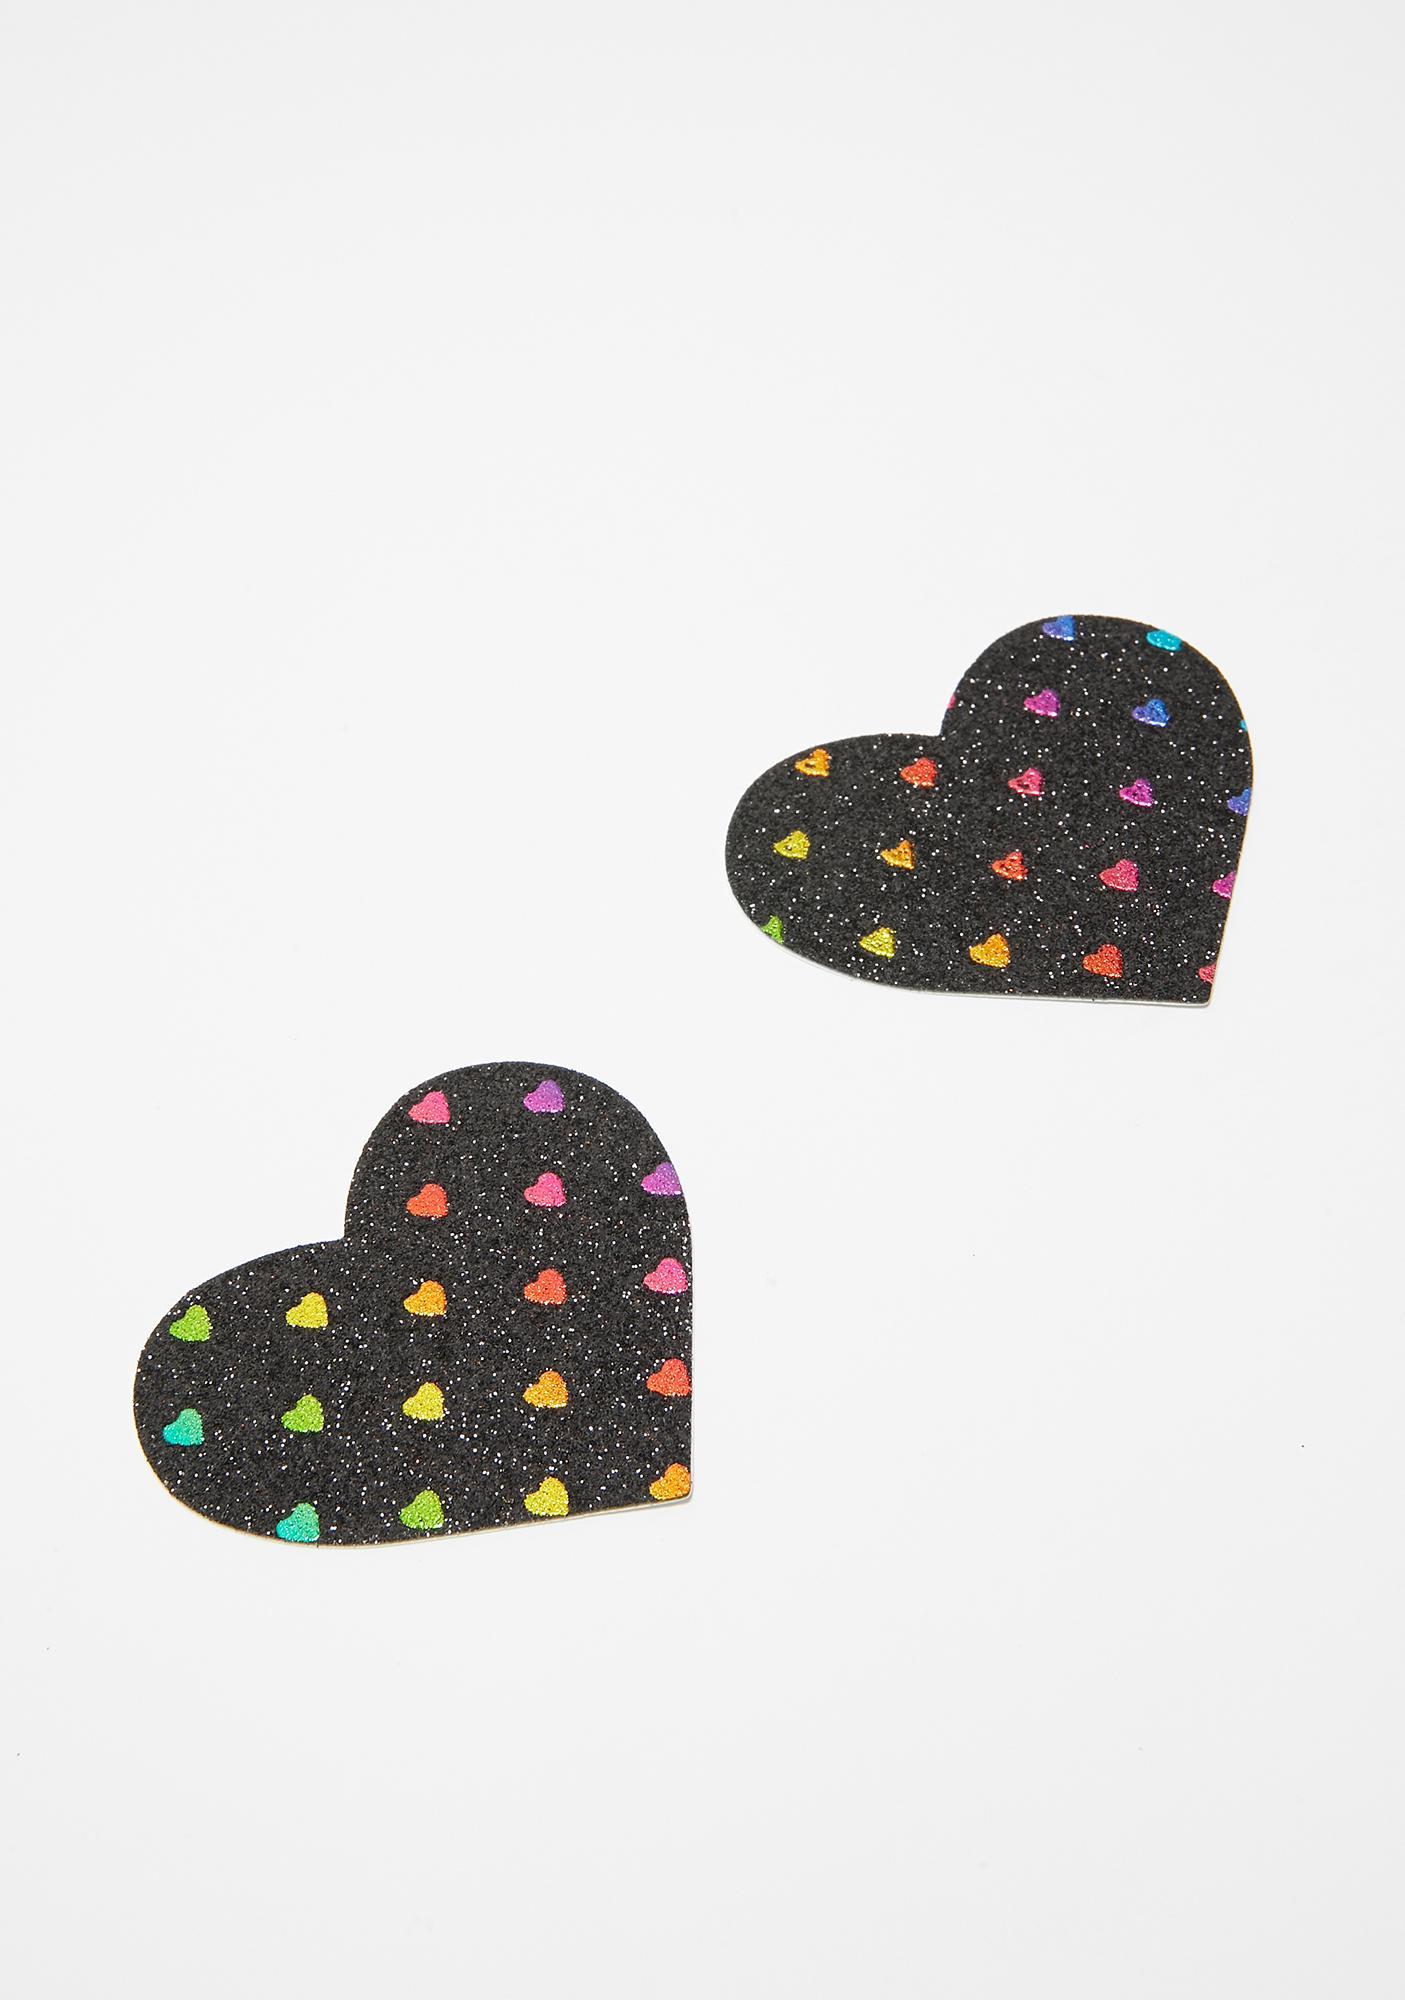 Neva Nude Black Rainbow Heart Pasties